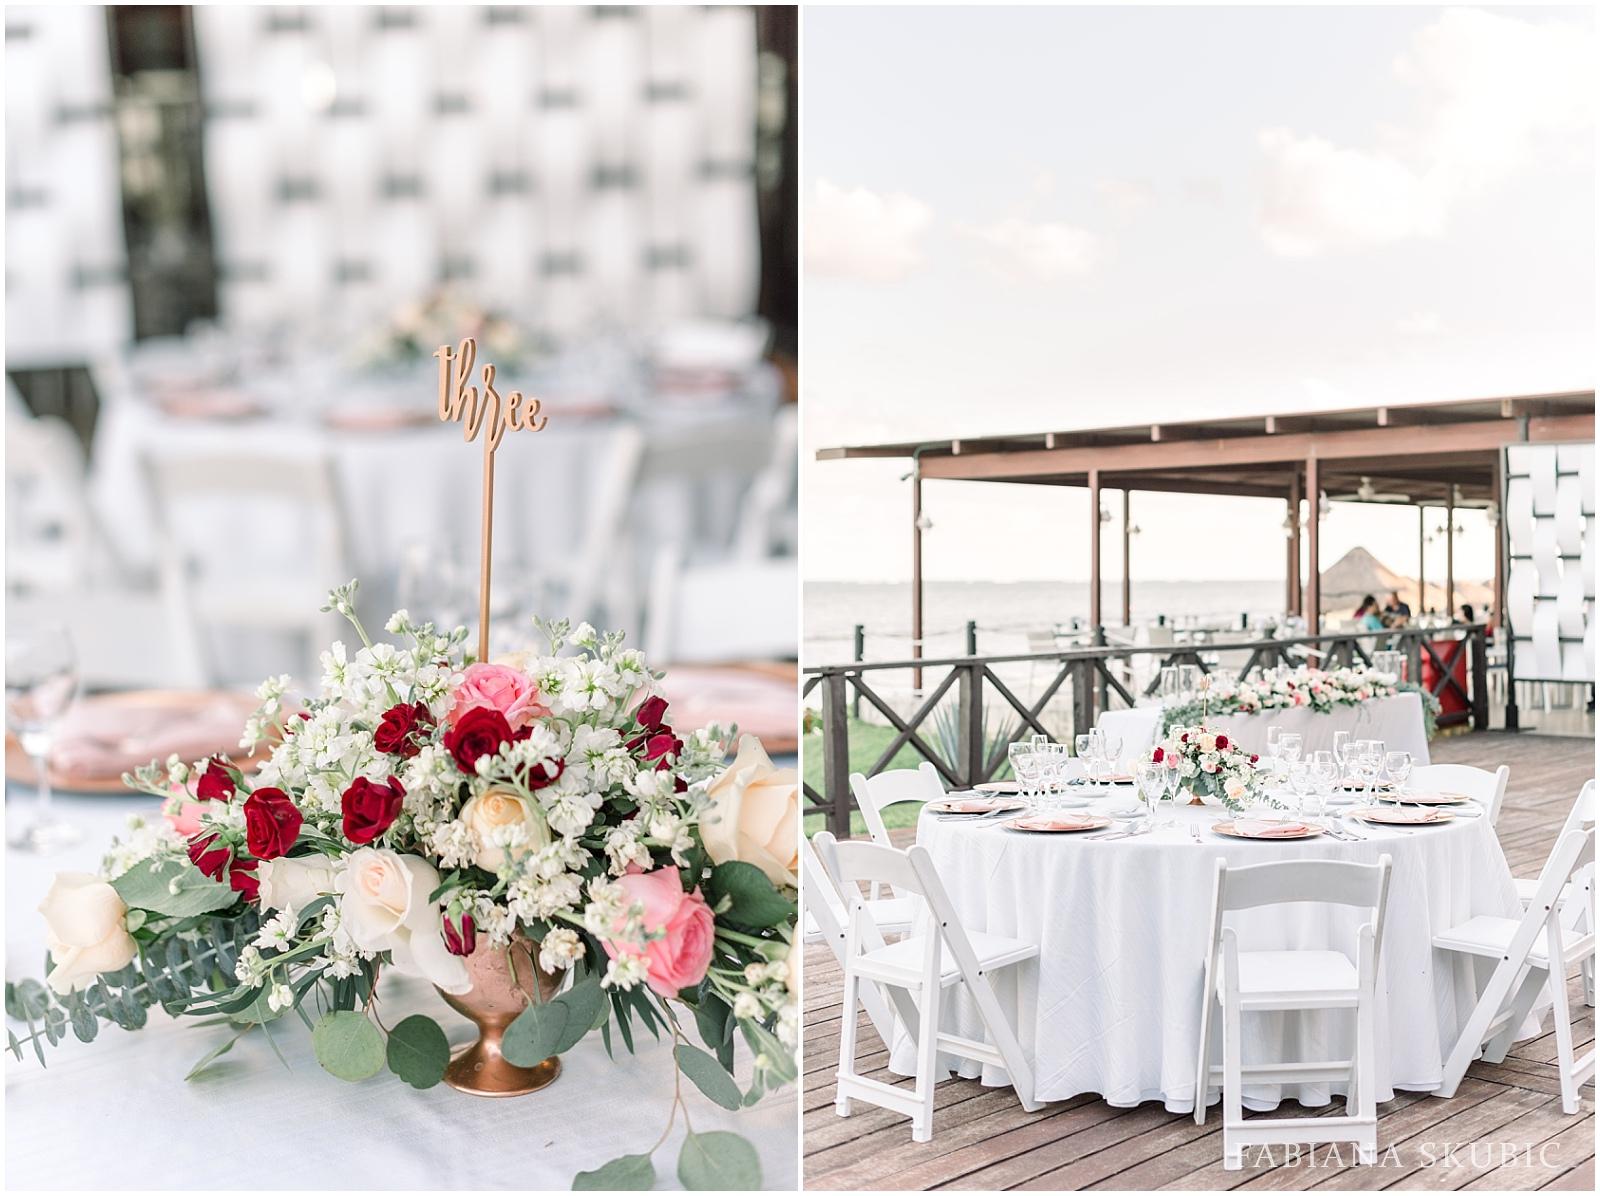 TJ_Now_Sapphire_Riviera_Cancun_Mexico_Wedding_Photos_0263.jpg